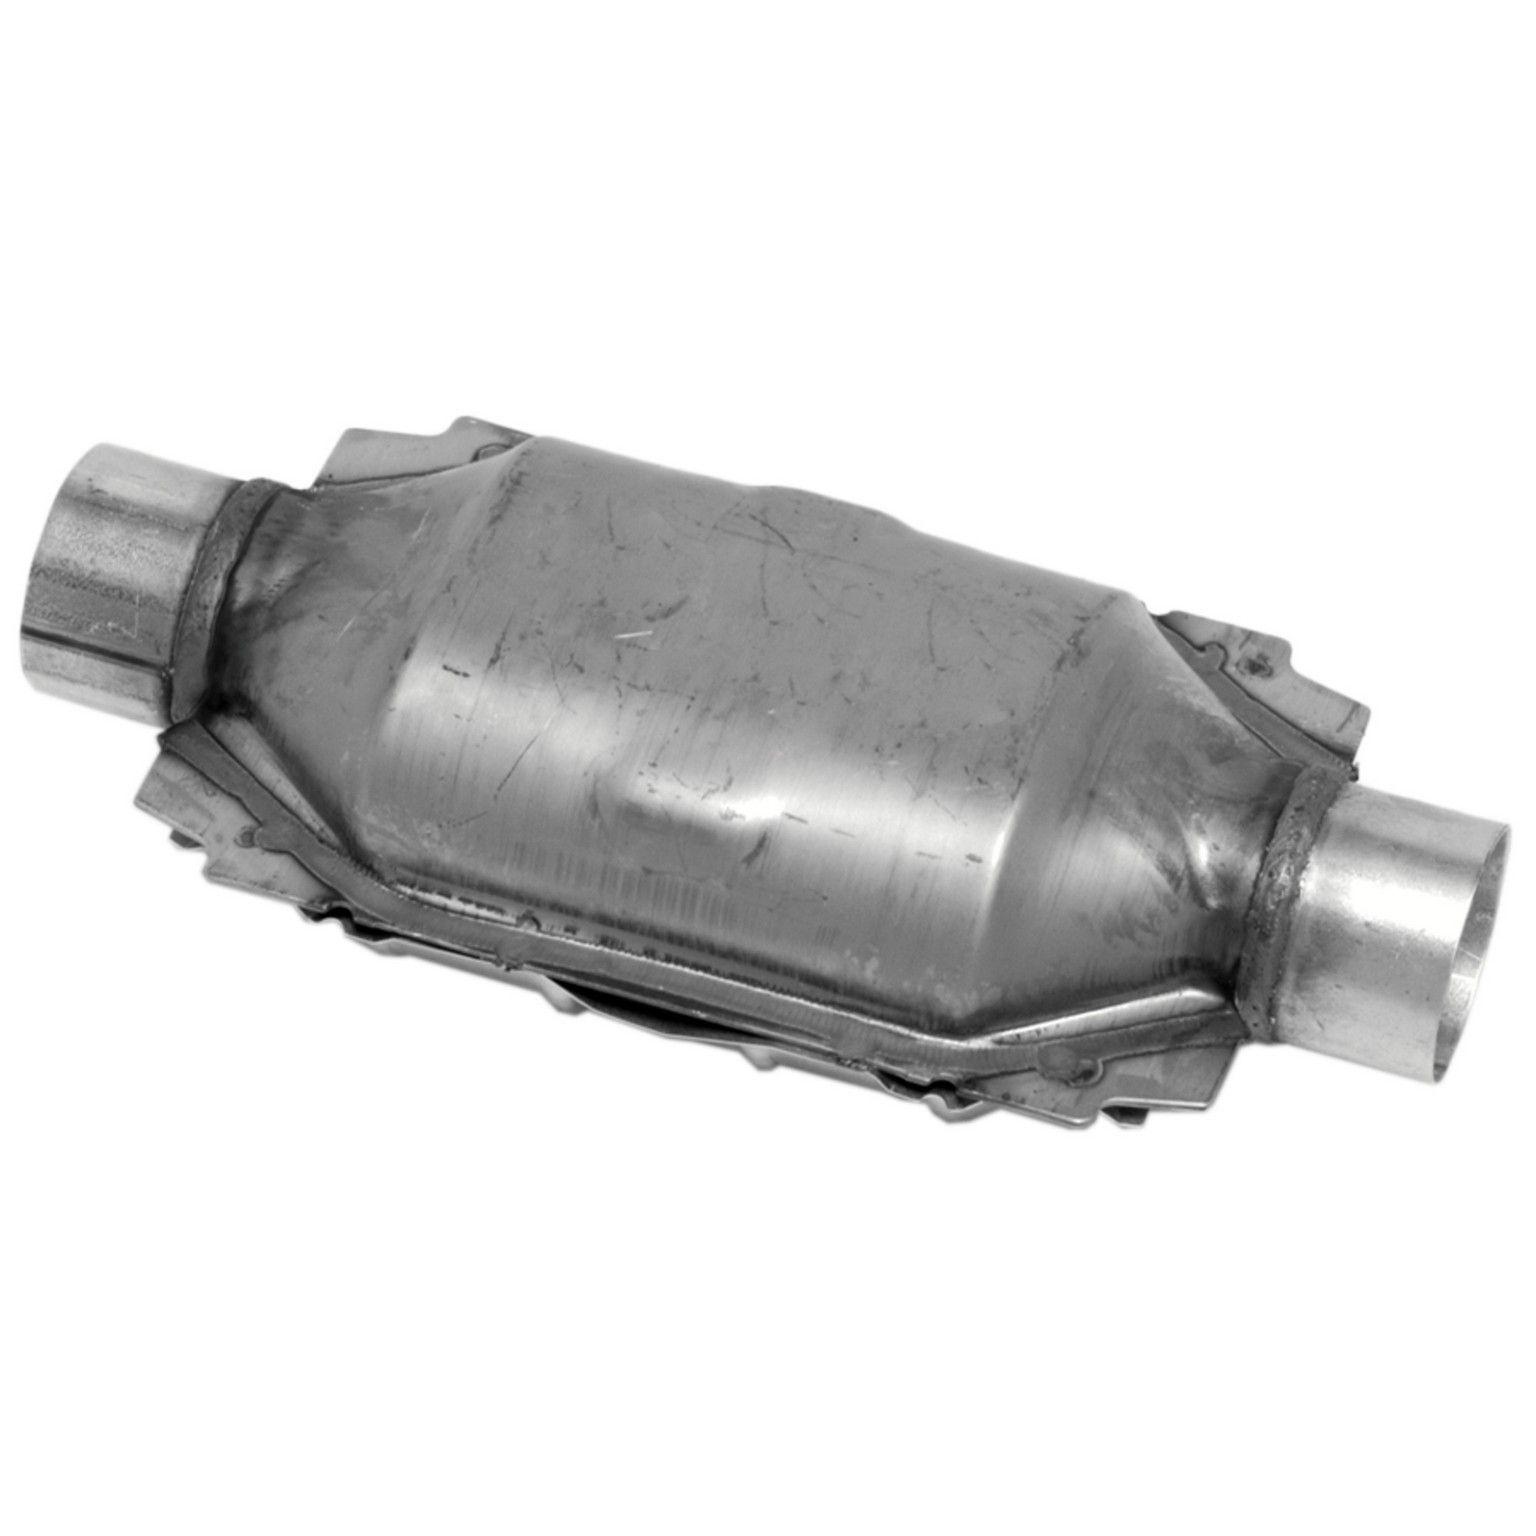 2002 mazda b3000 parts